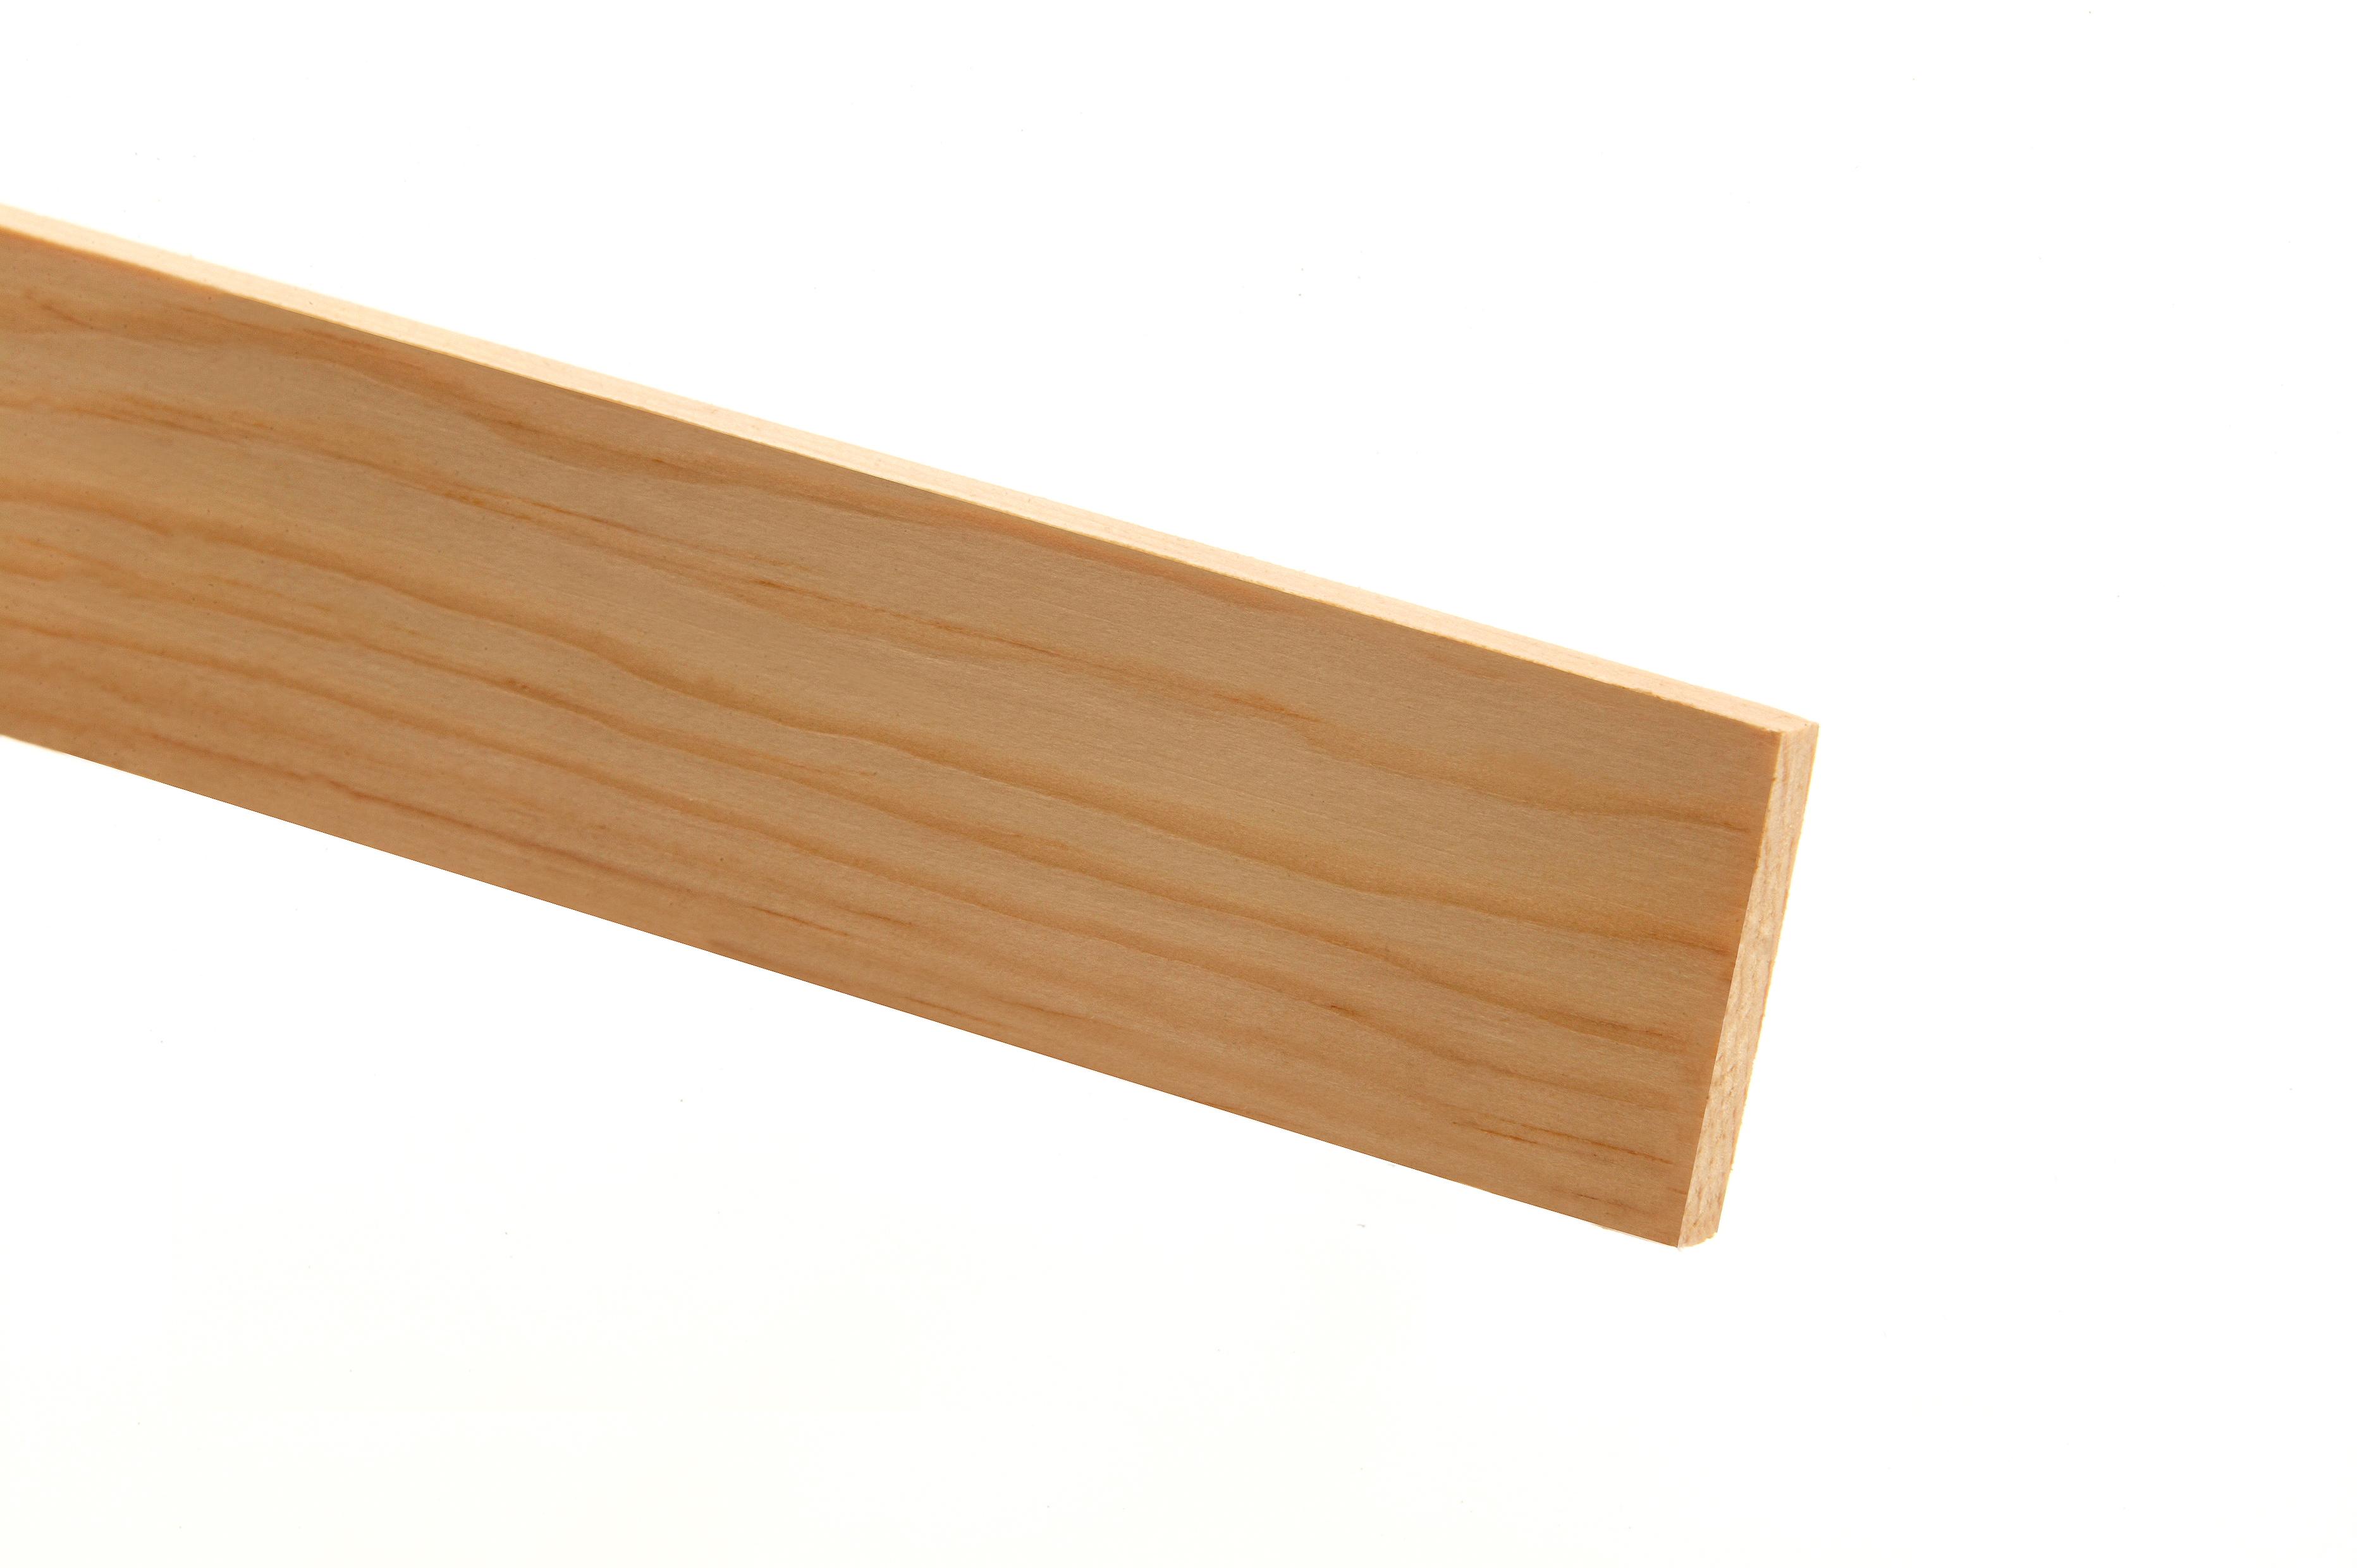 20 Pine PSE Stripwood 15 x 21 x 2400mm